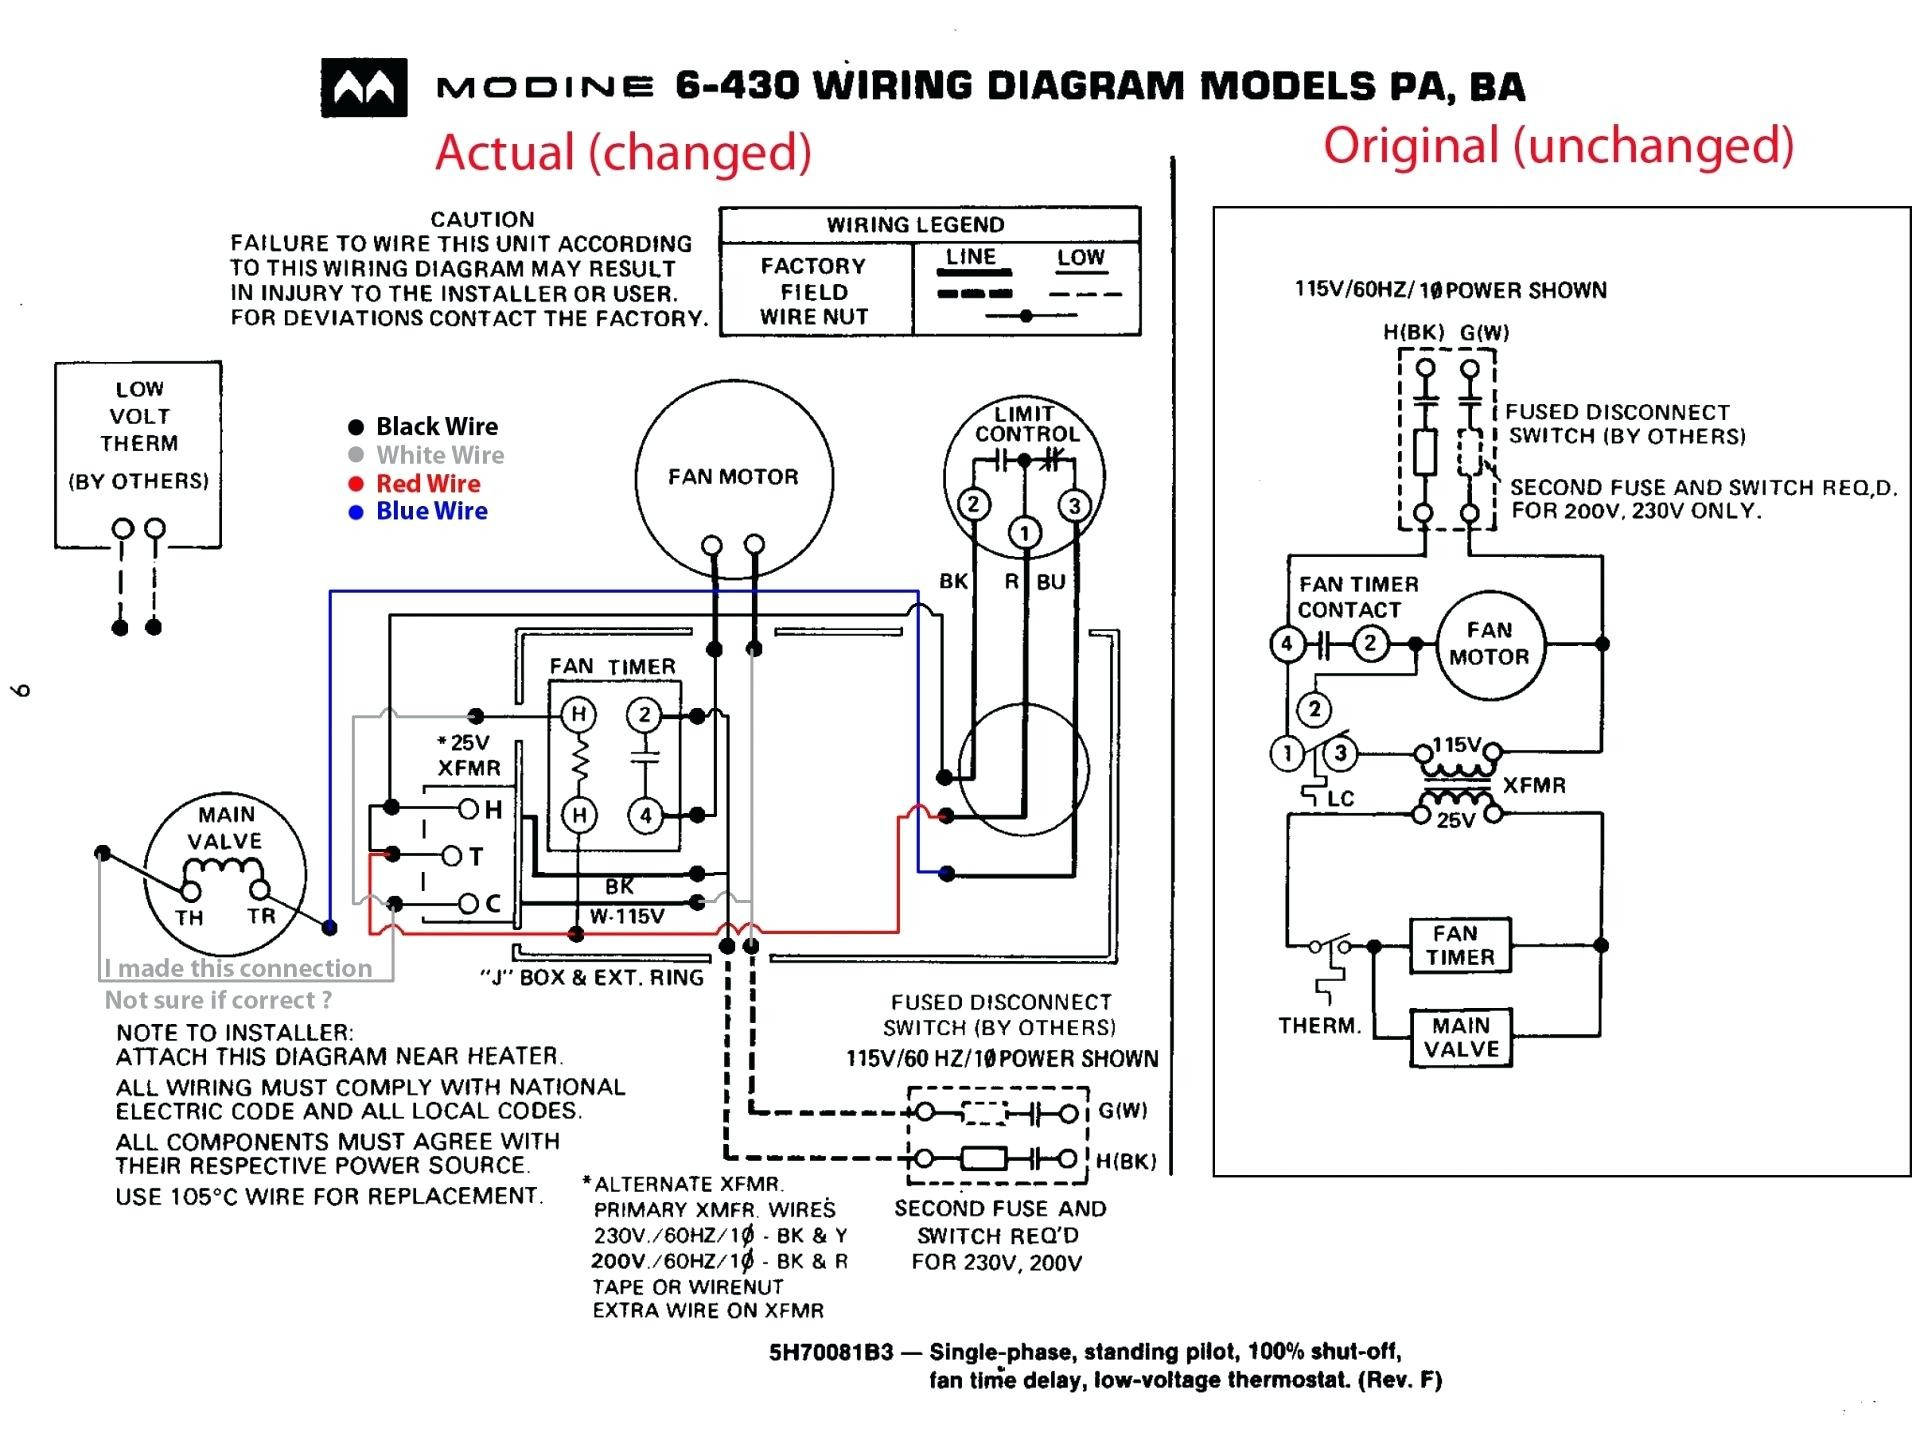 honeywell s8610u wiring diagram honeywell fan relays wiring diagrams rh detoxicrecenze com honeywell aquastat relay wiring diagram honeywell aquastat relay l8148e wiring diagram